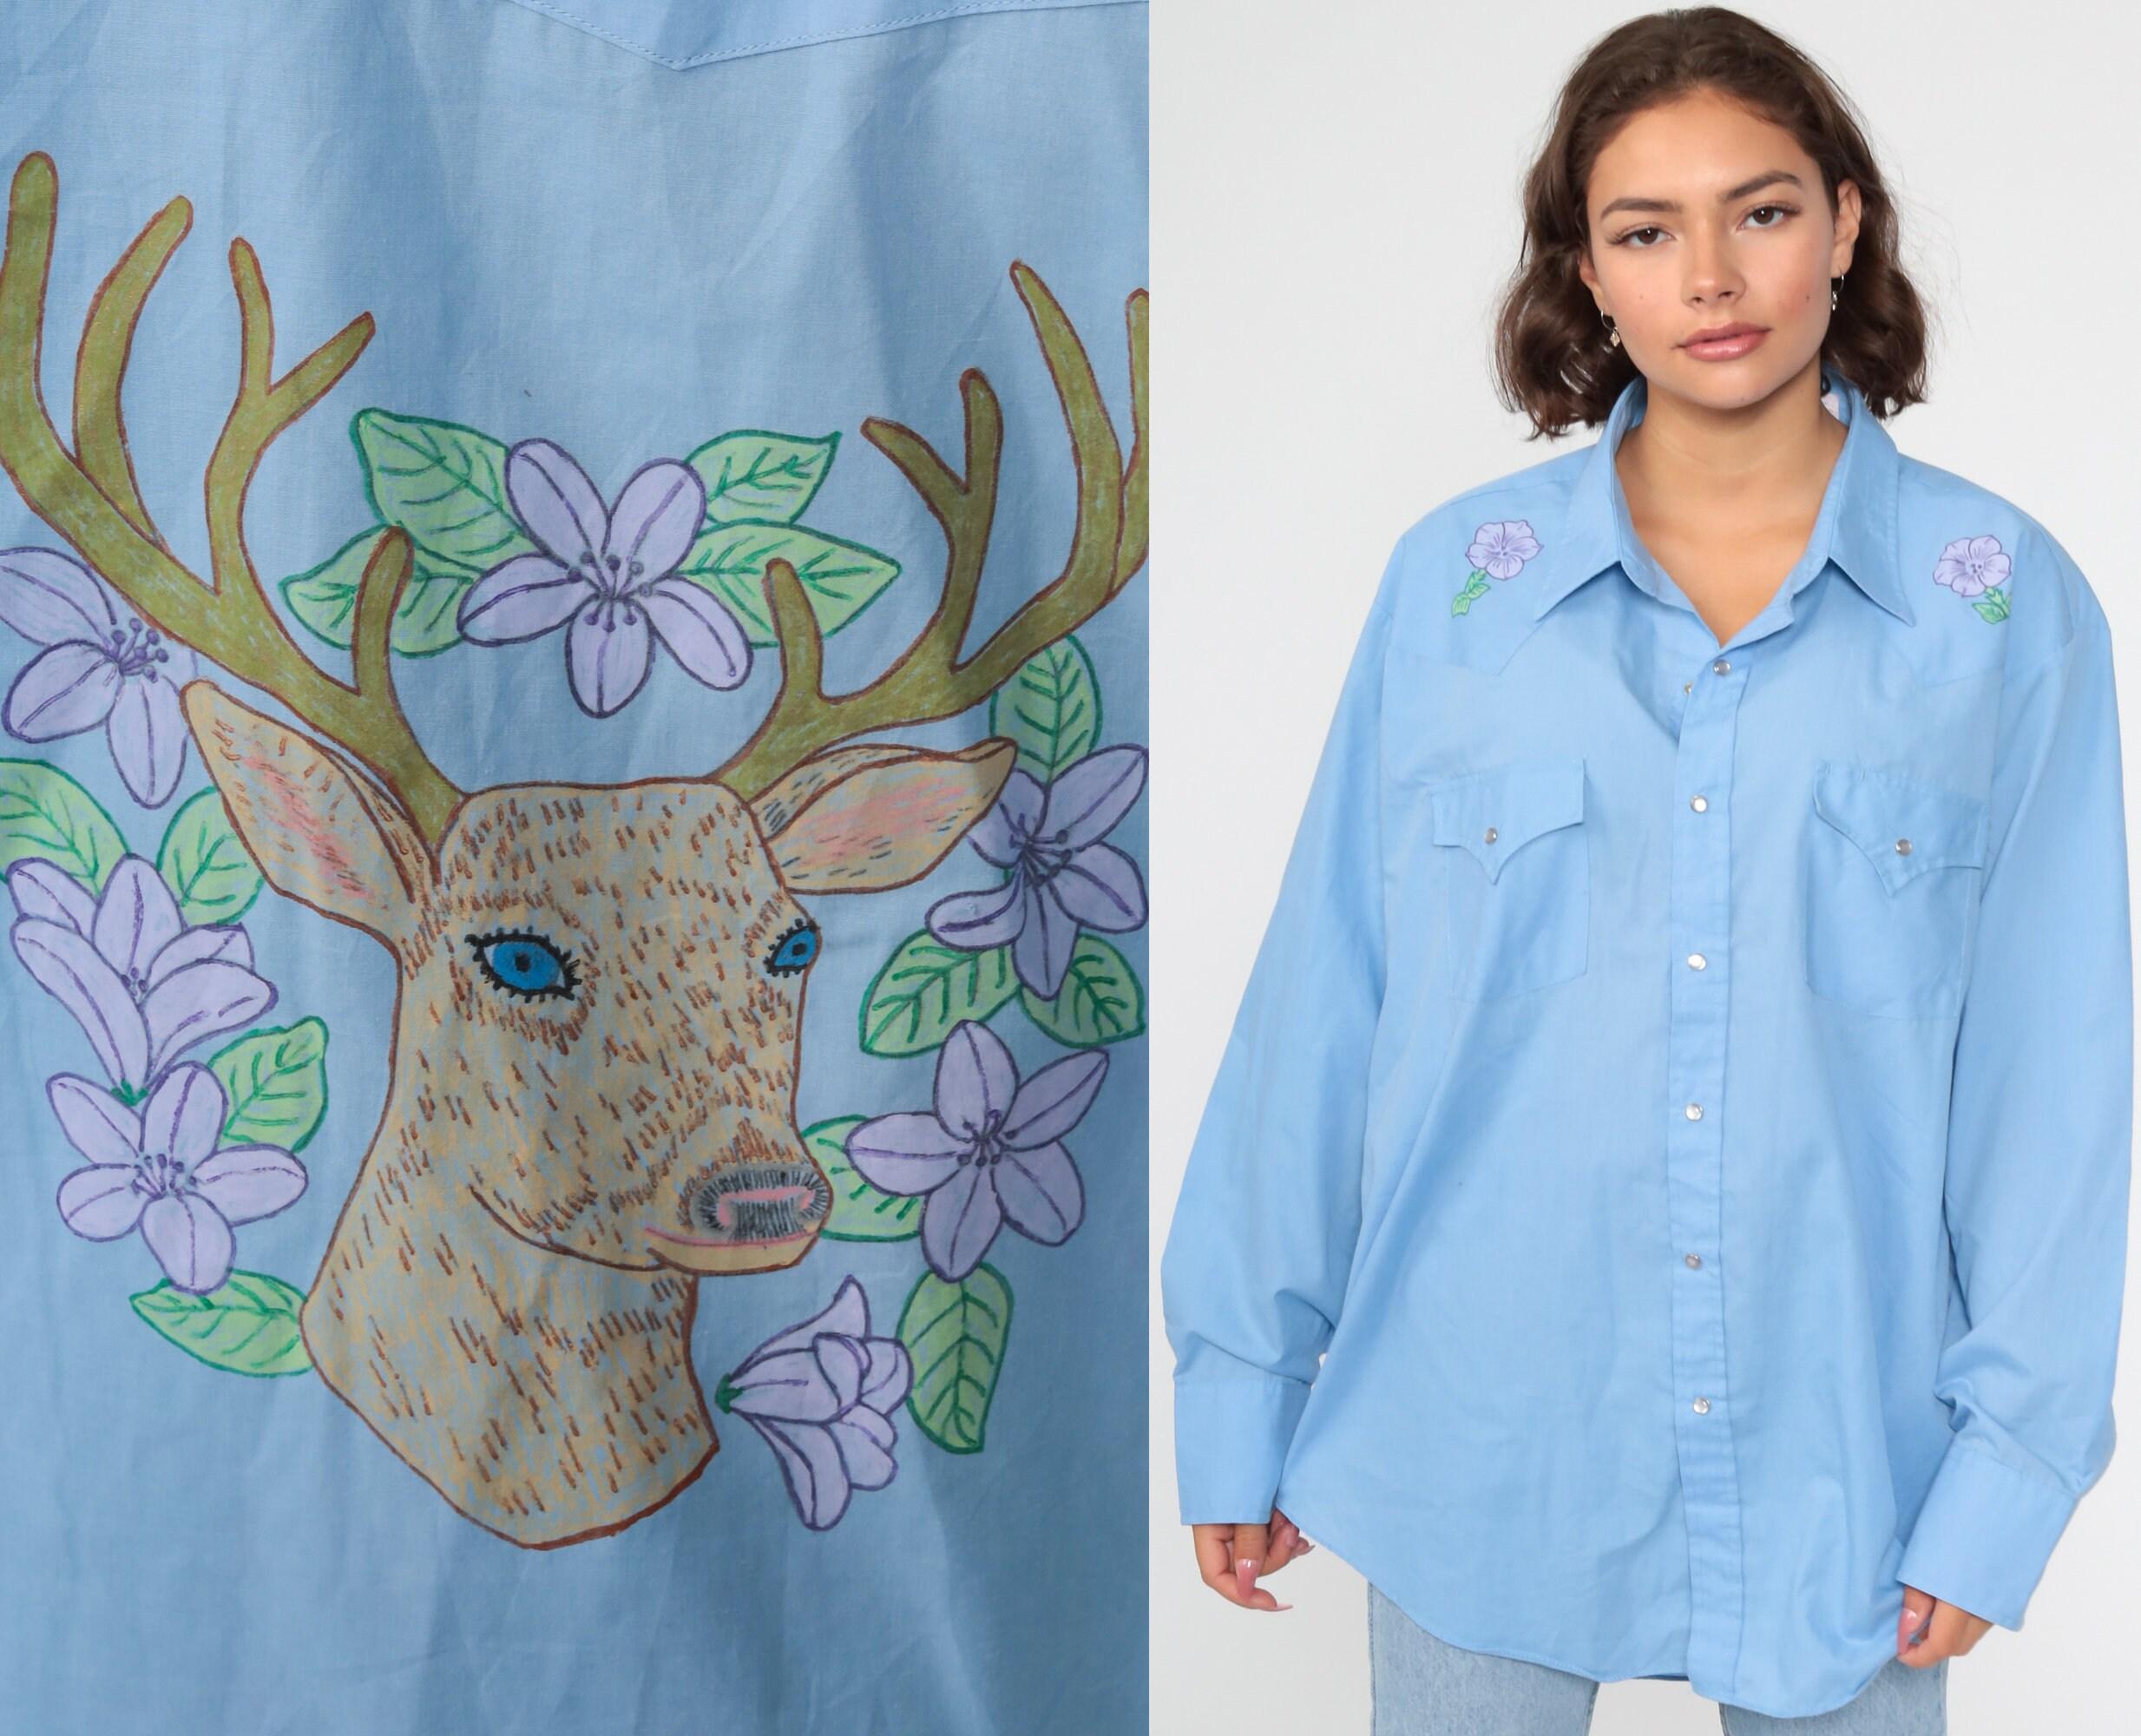 1970s Men's Shirt Styles – Vintage 70s Shirts for Guys Western Deer Shirt 70S Floral Blue Hand Drawn Pearl Snap 1970S Vintage Button Up Boho Long Sleeve Cotton Rockabilly Medium Large $59.00 AT vintagedancer.com